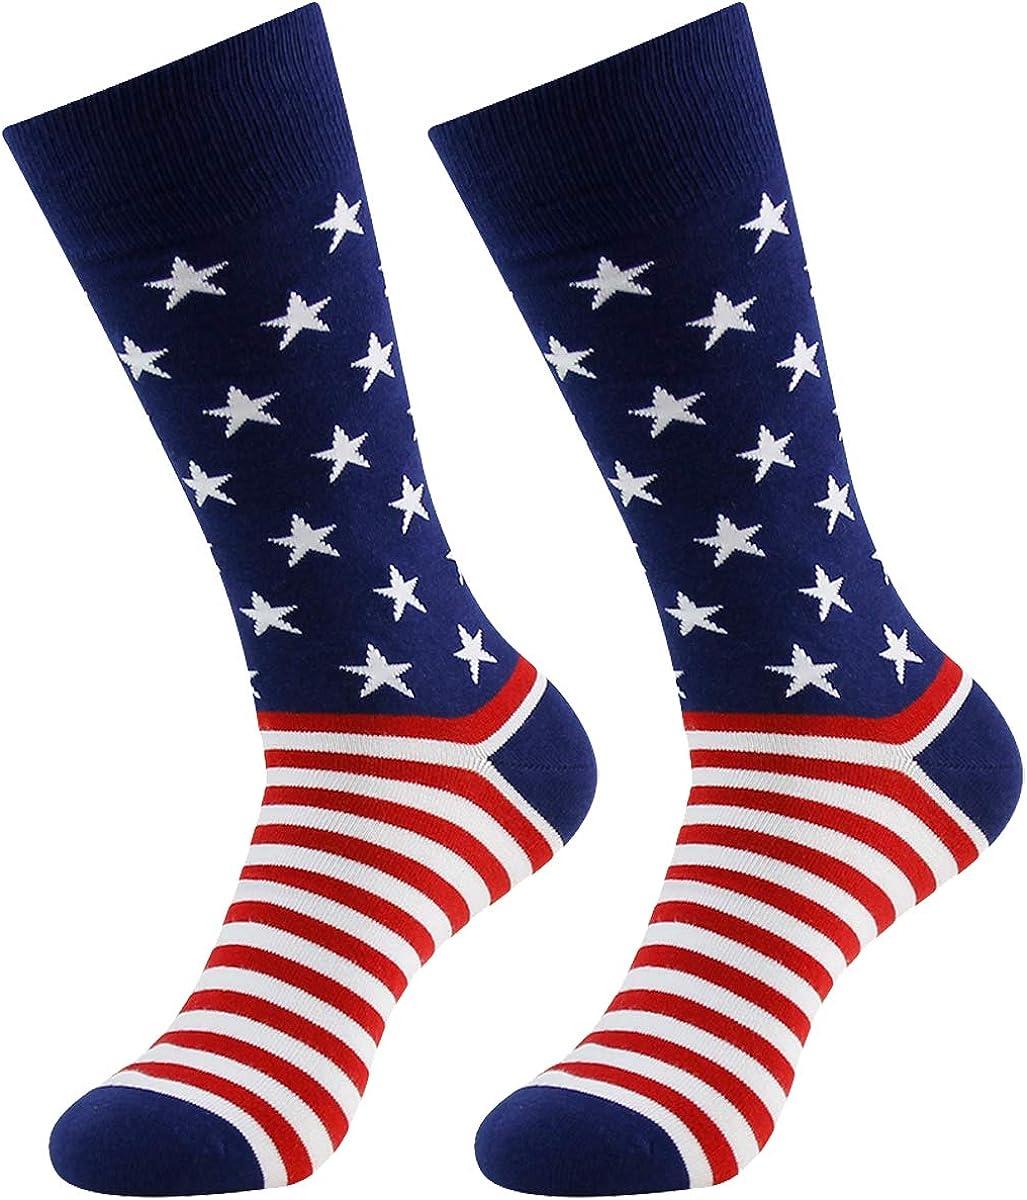 Blue Thin Line Flag Printed Crew Socks Warm Over Boots Stocking Stylish Warm Sports Socks